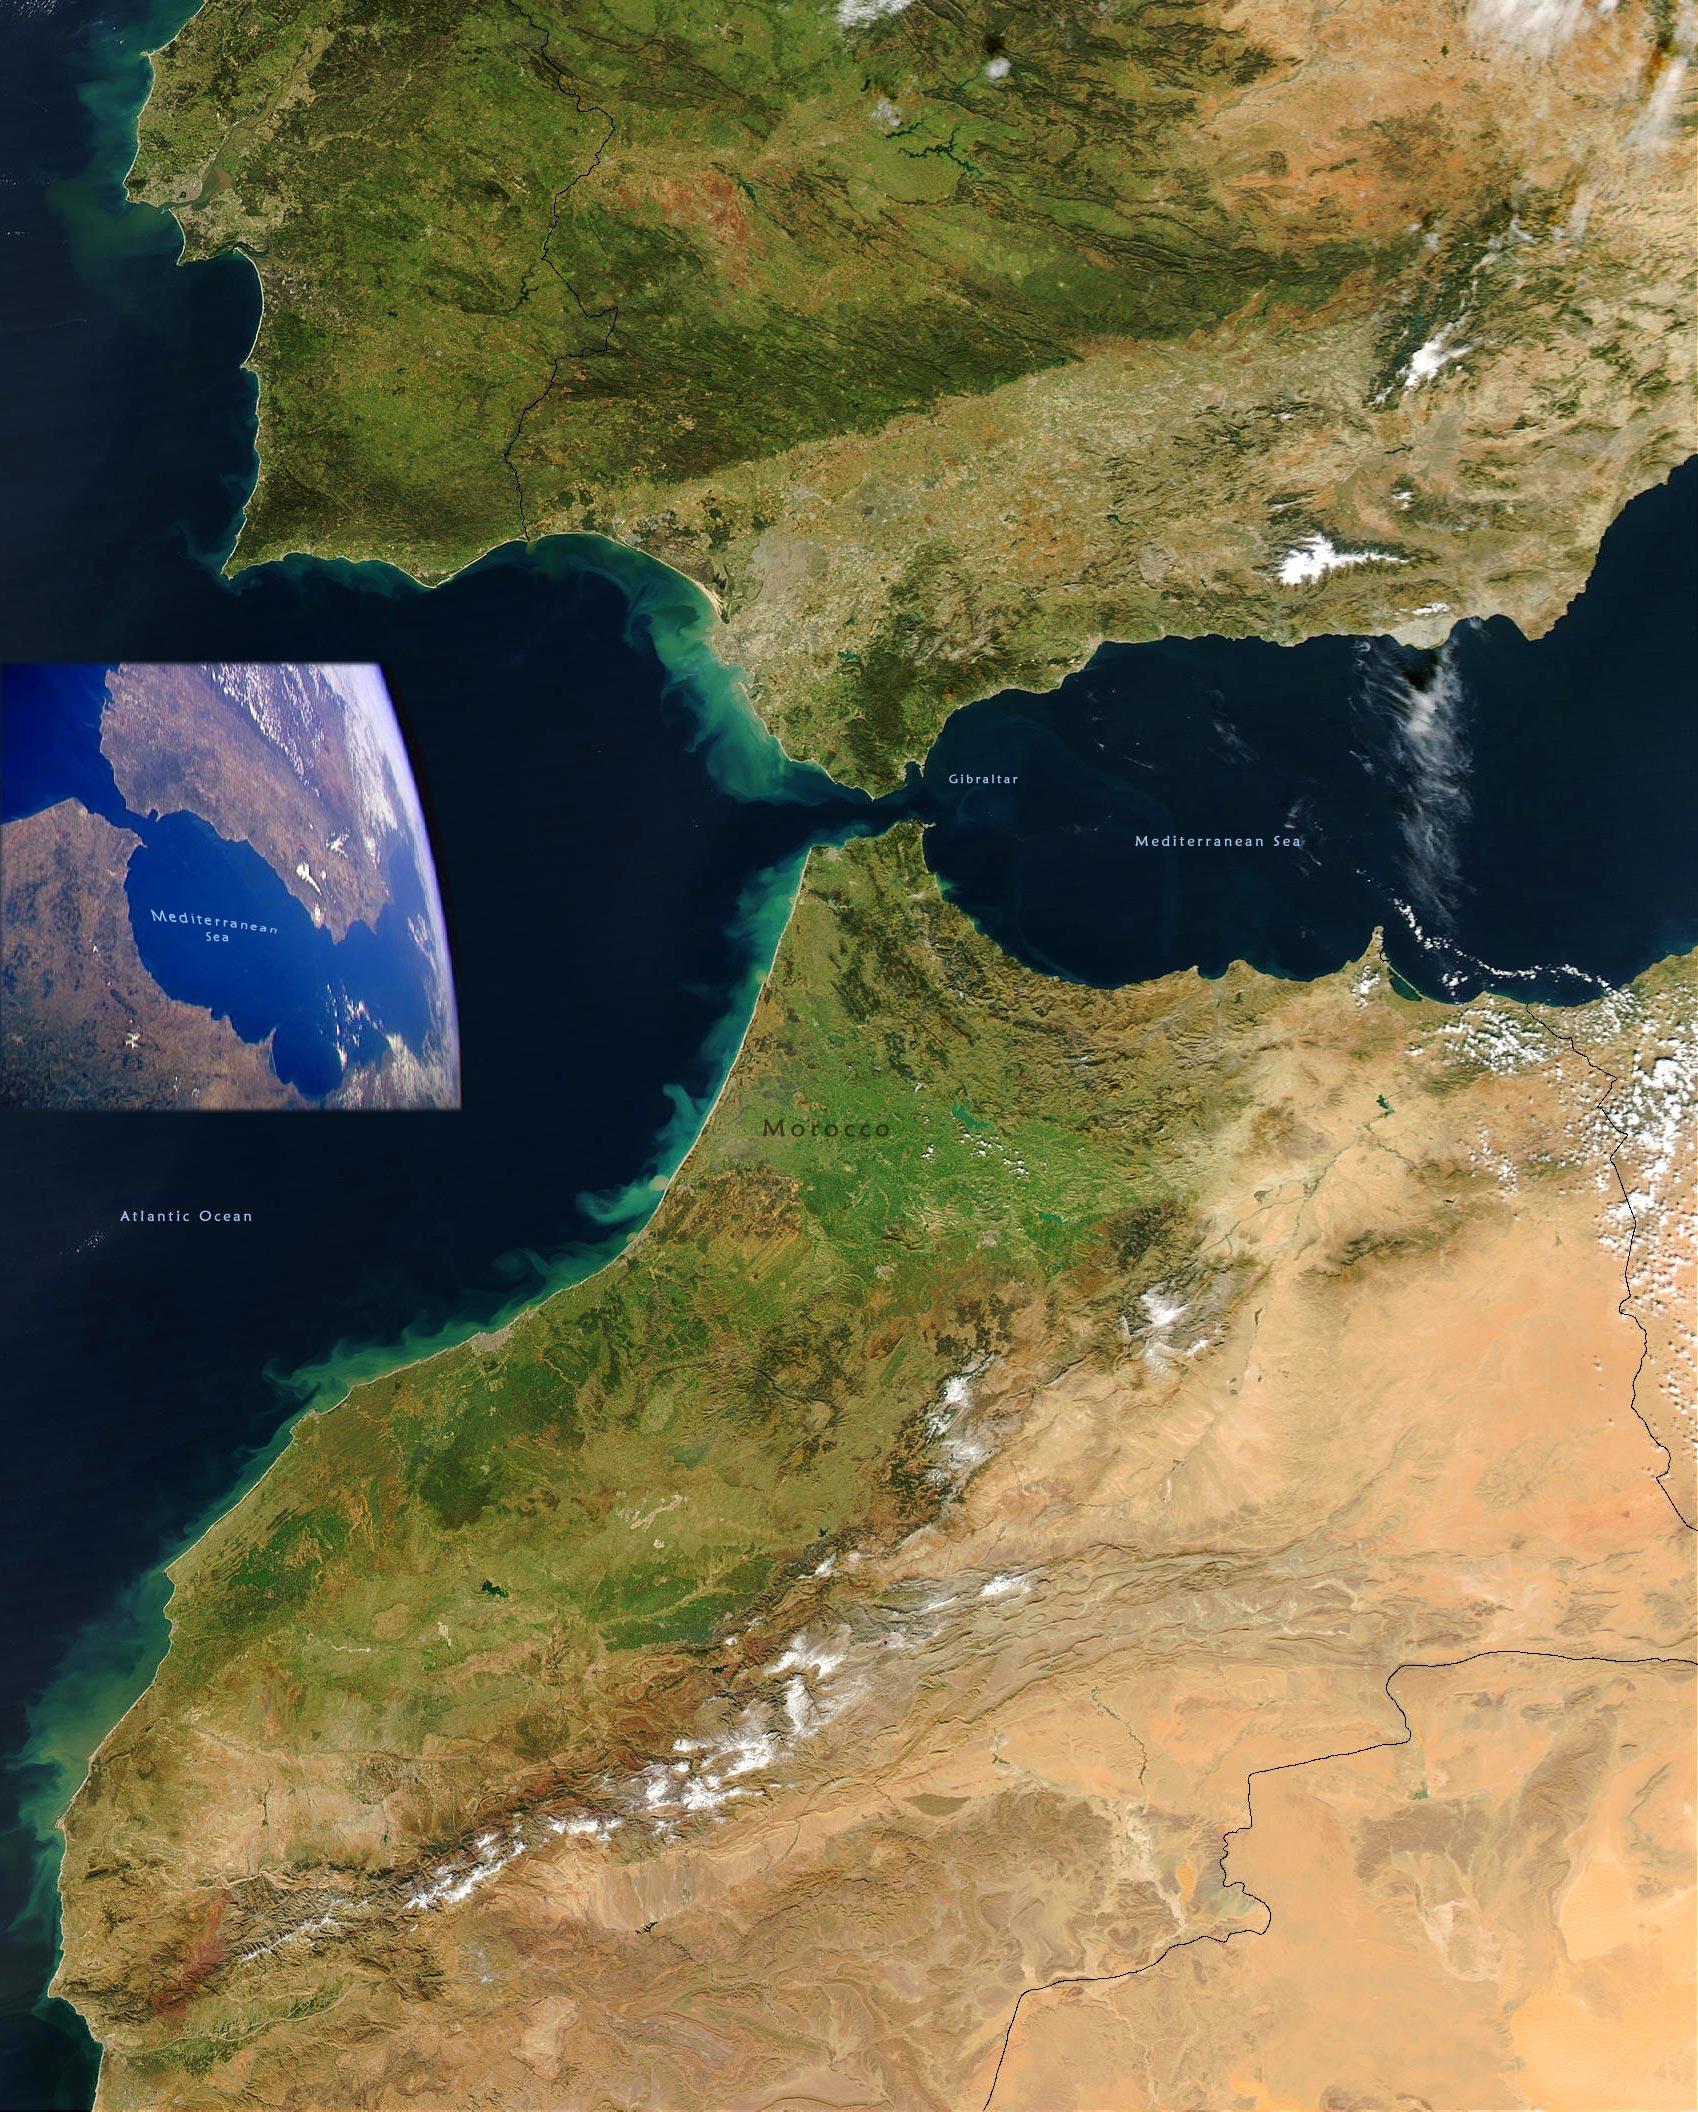 MICHELIN Strait of Gibraltar map - ViaMichelin